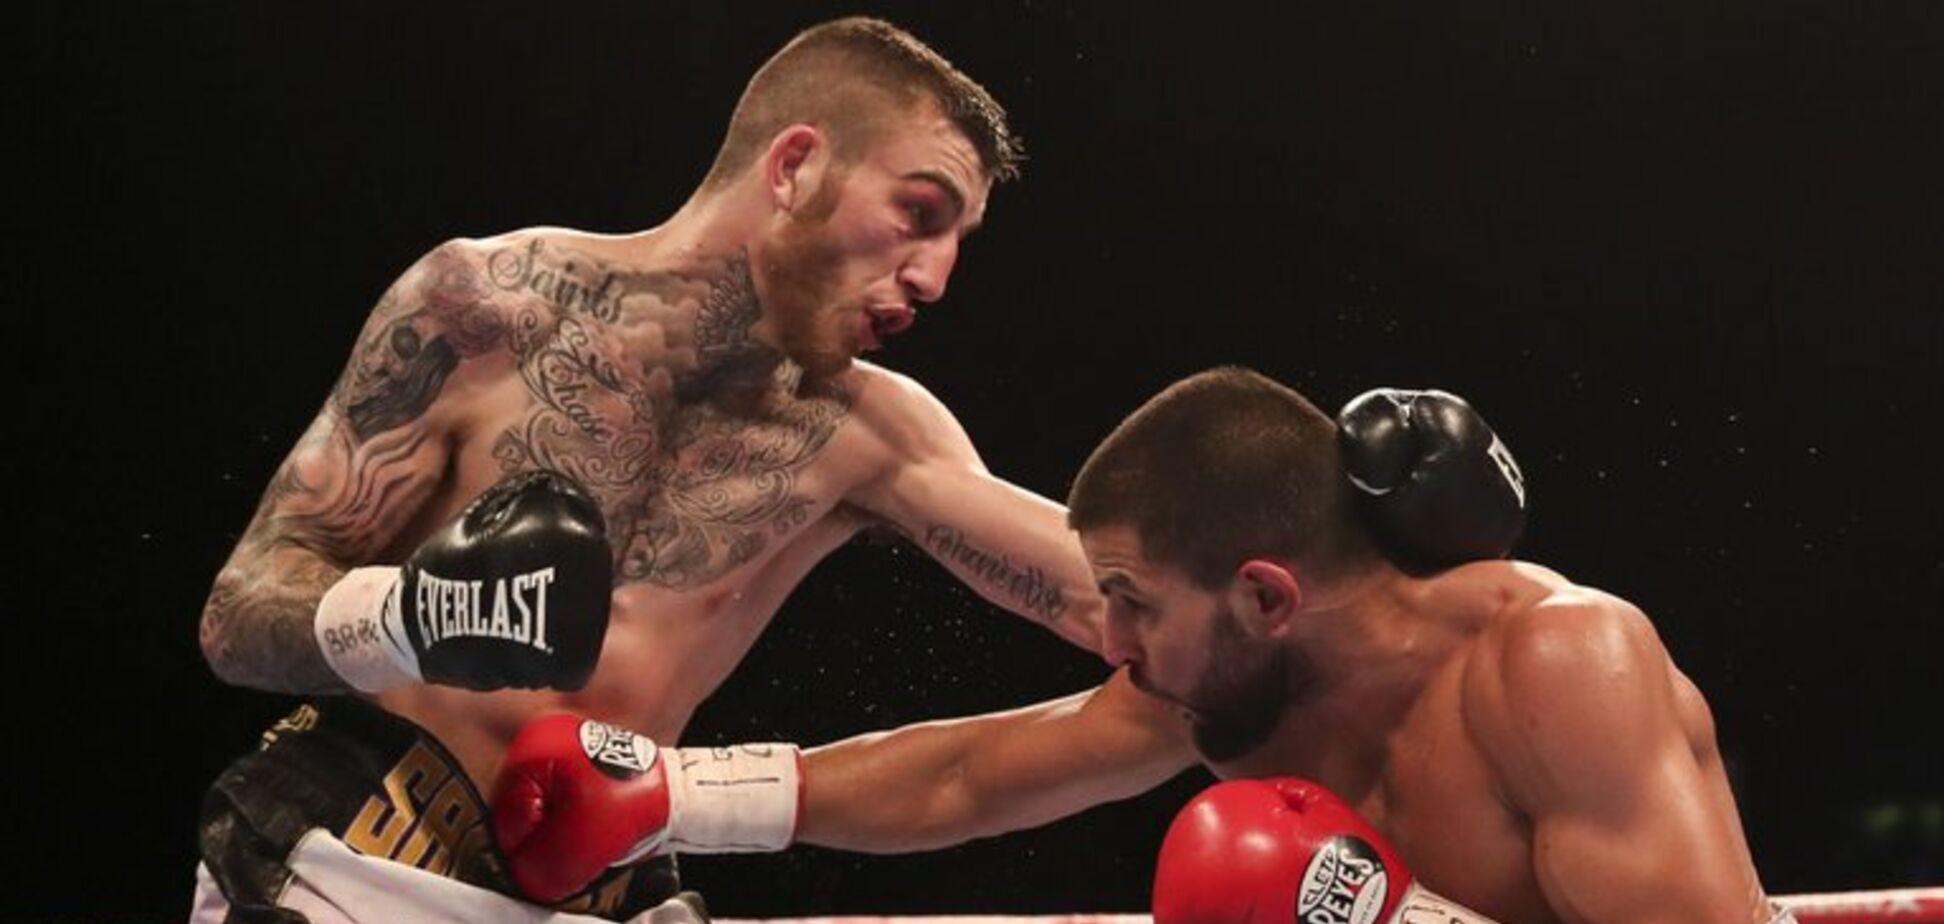 Британский боксер жестко забил чемпиона и взял титул - видео нокаута